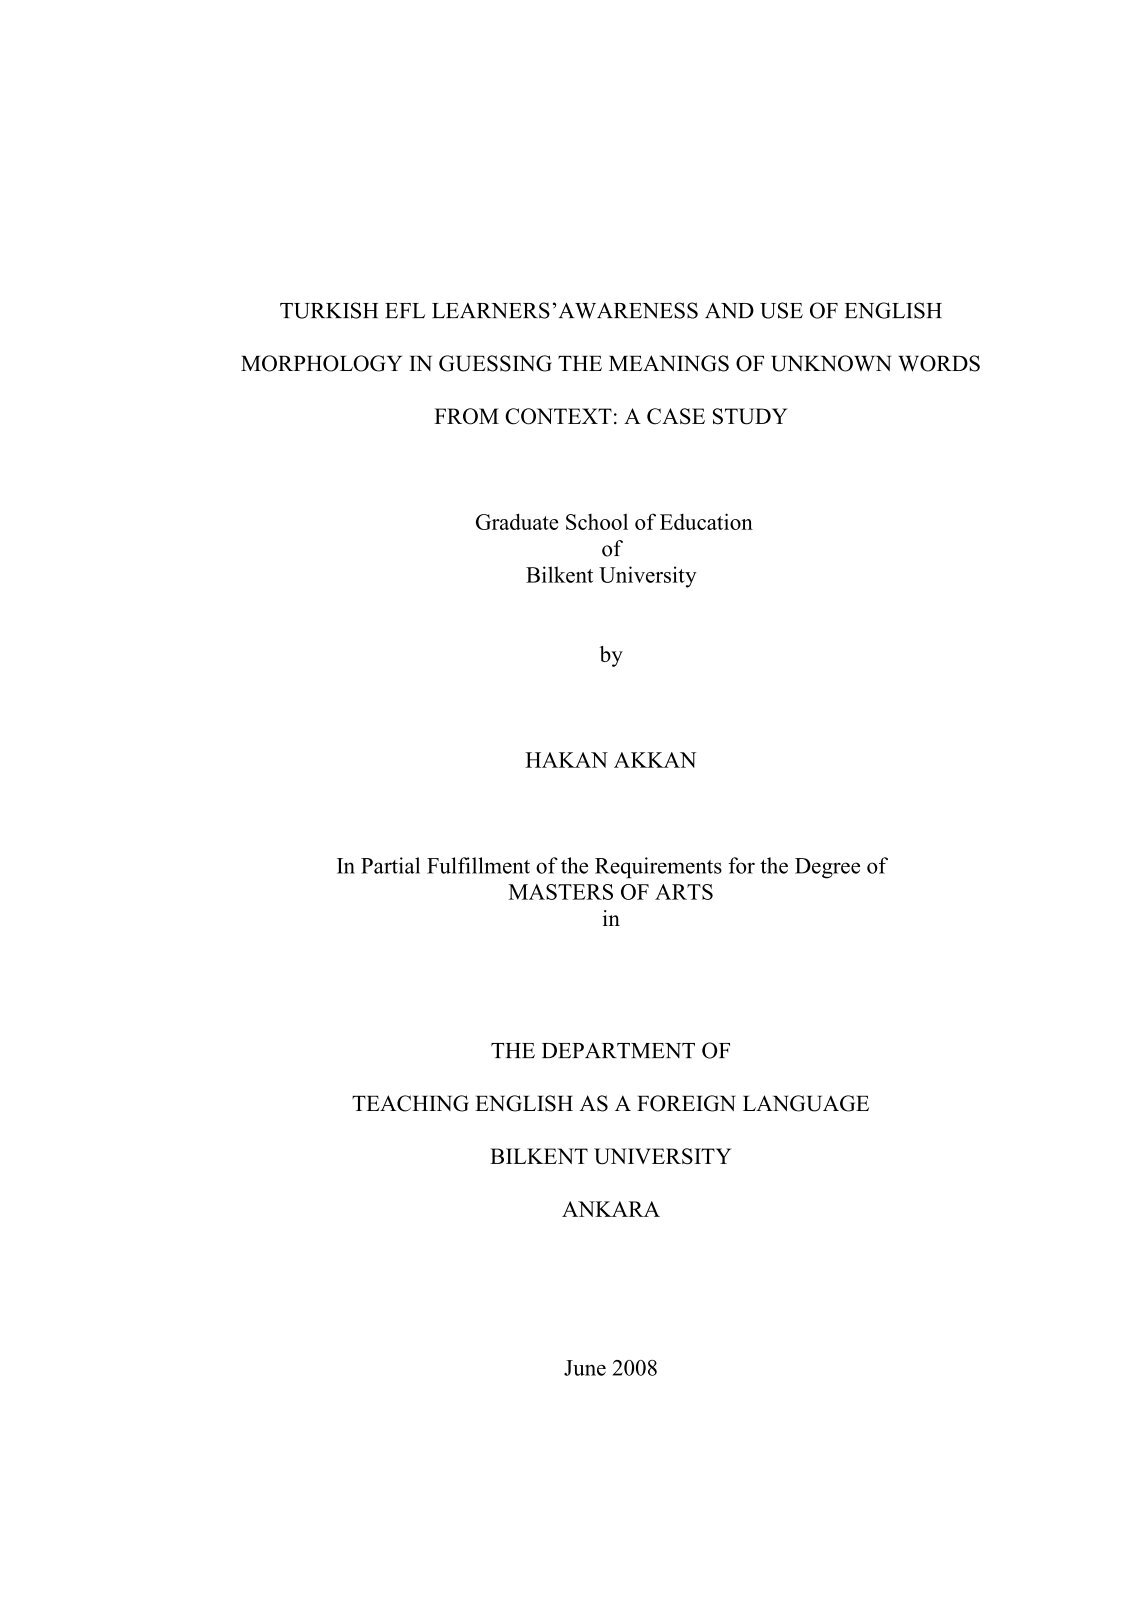 https://img.yumpu.com/27094346/1/1140x1616/turkish-efl-learnersawareness-and-use-of-english-bilkent-university.jpg?quality\u003d85